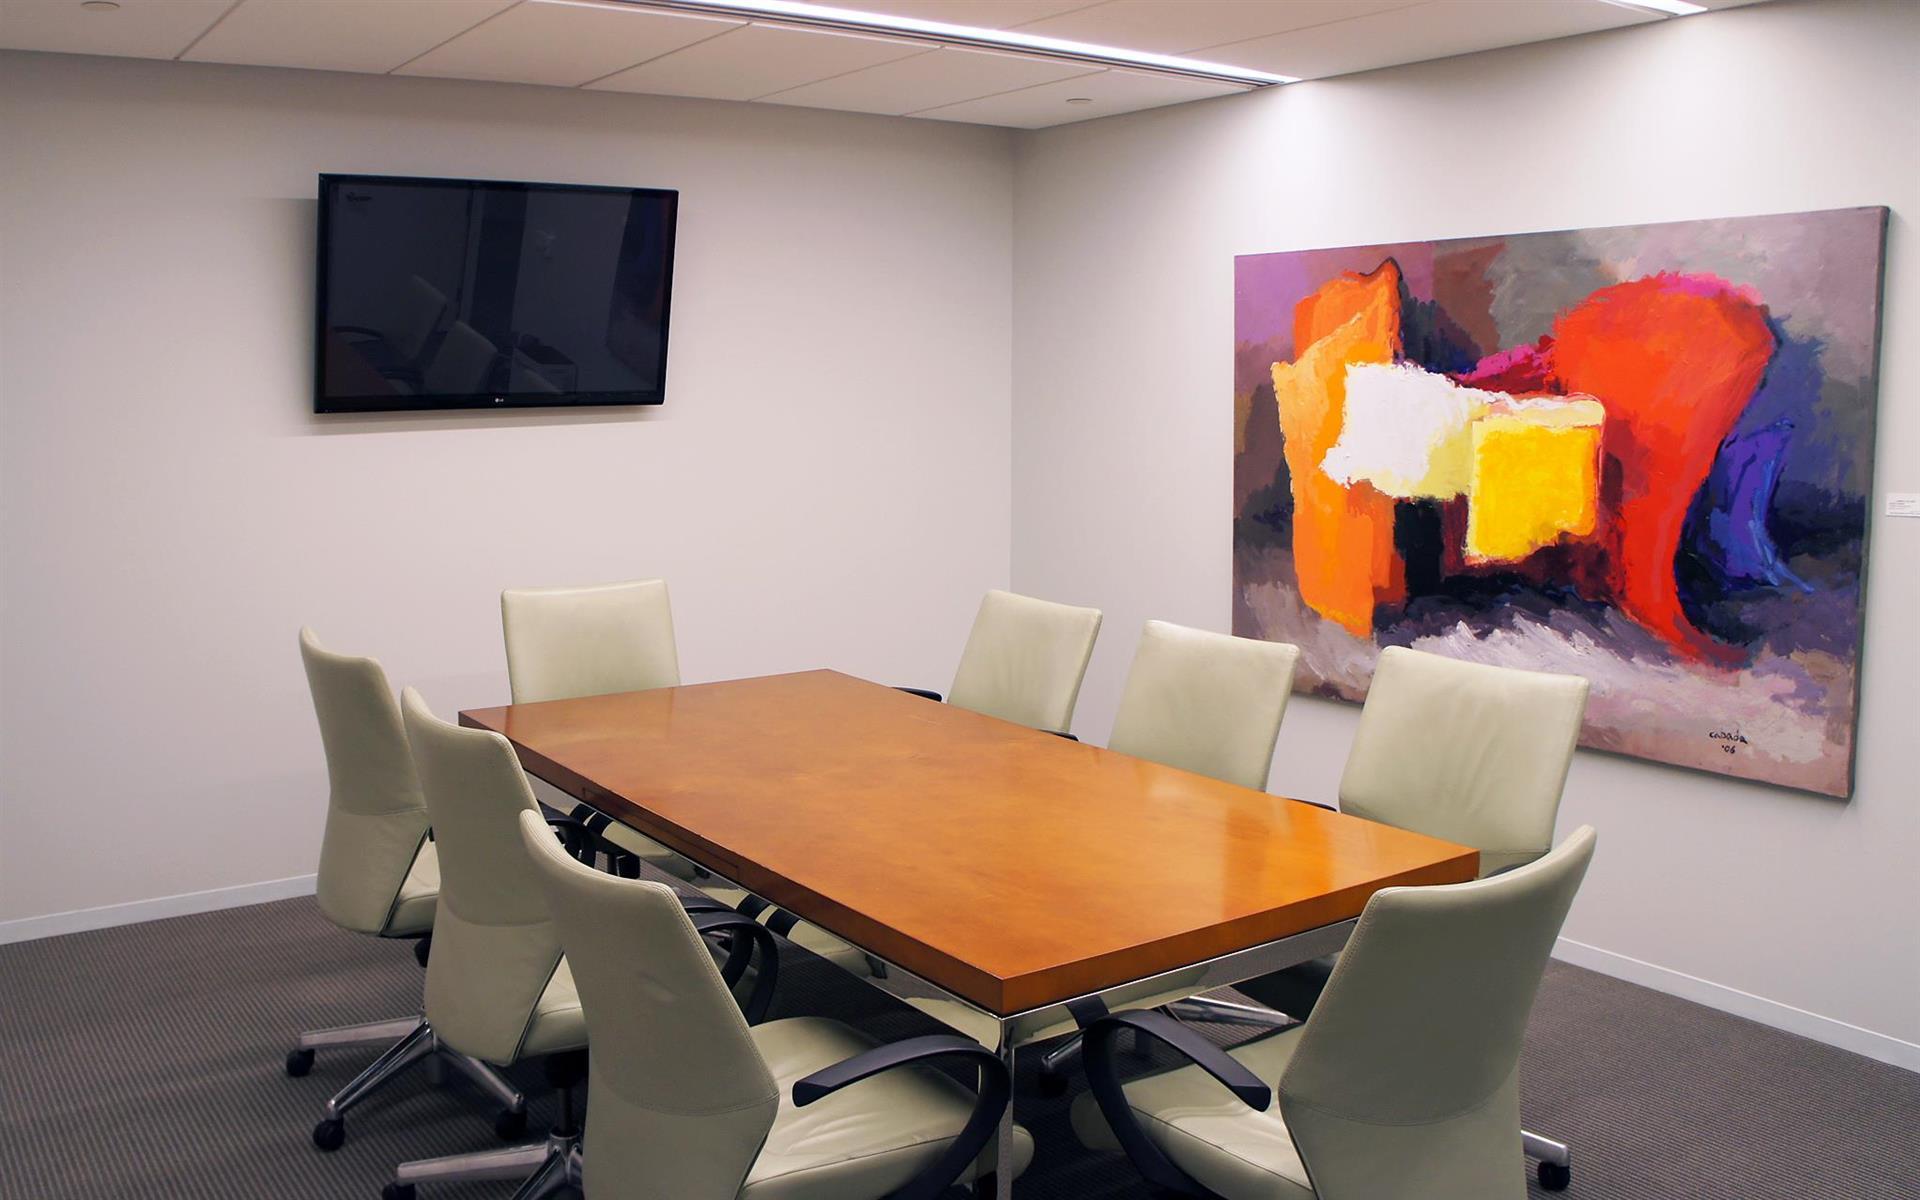 AdvantEdge BC - Downtown Center - Conference Room #2, Suite 800